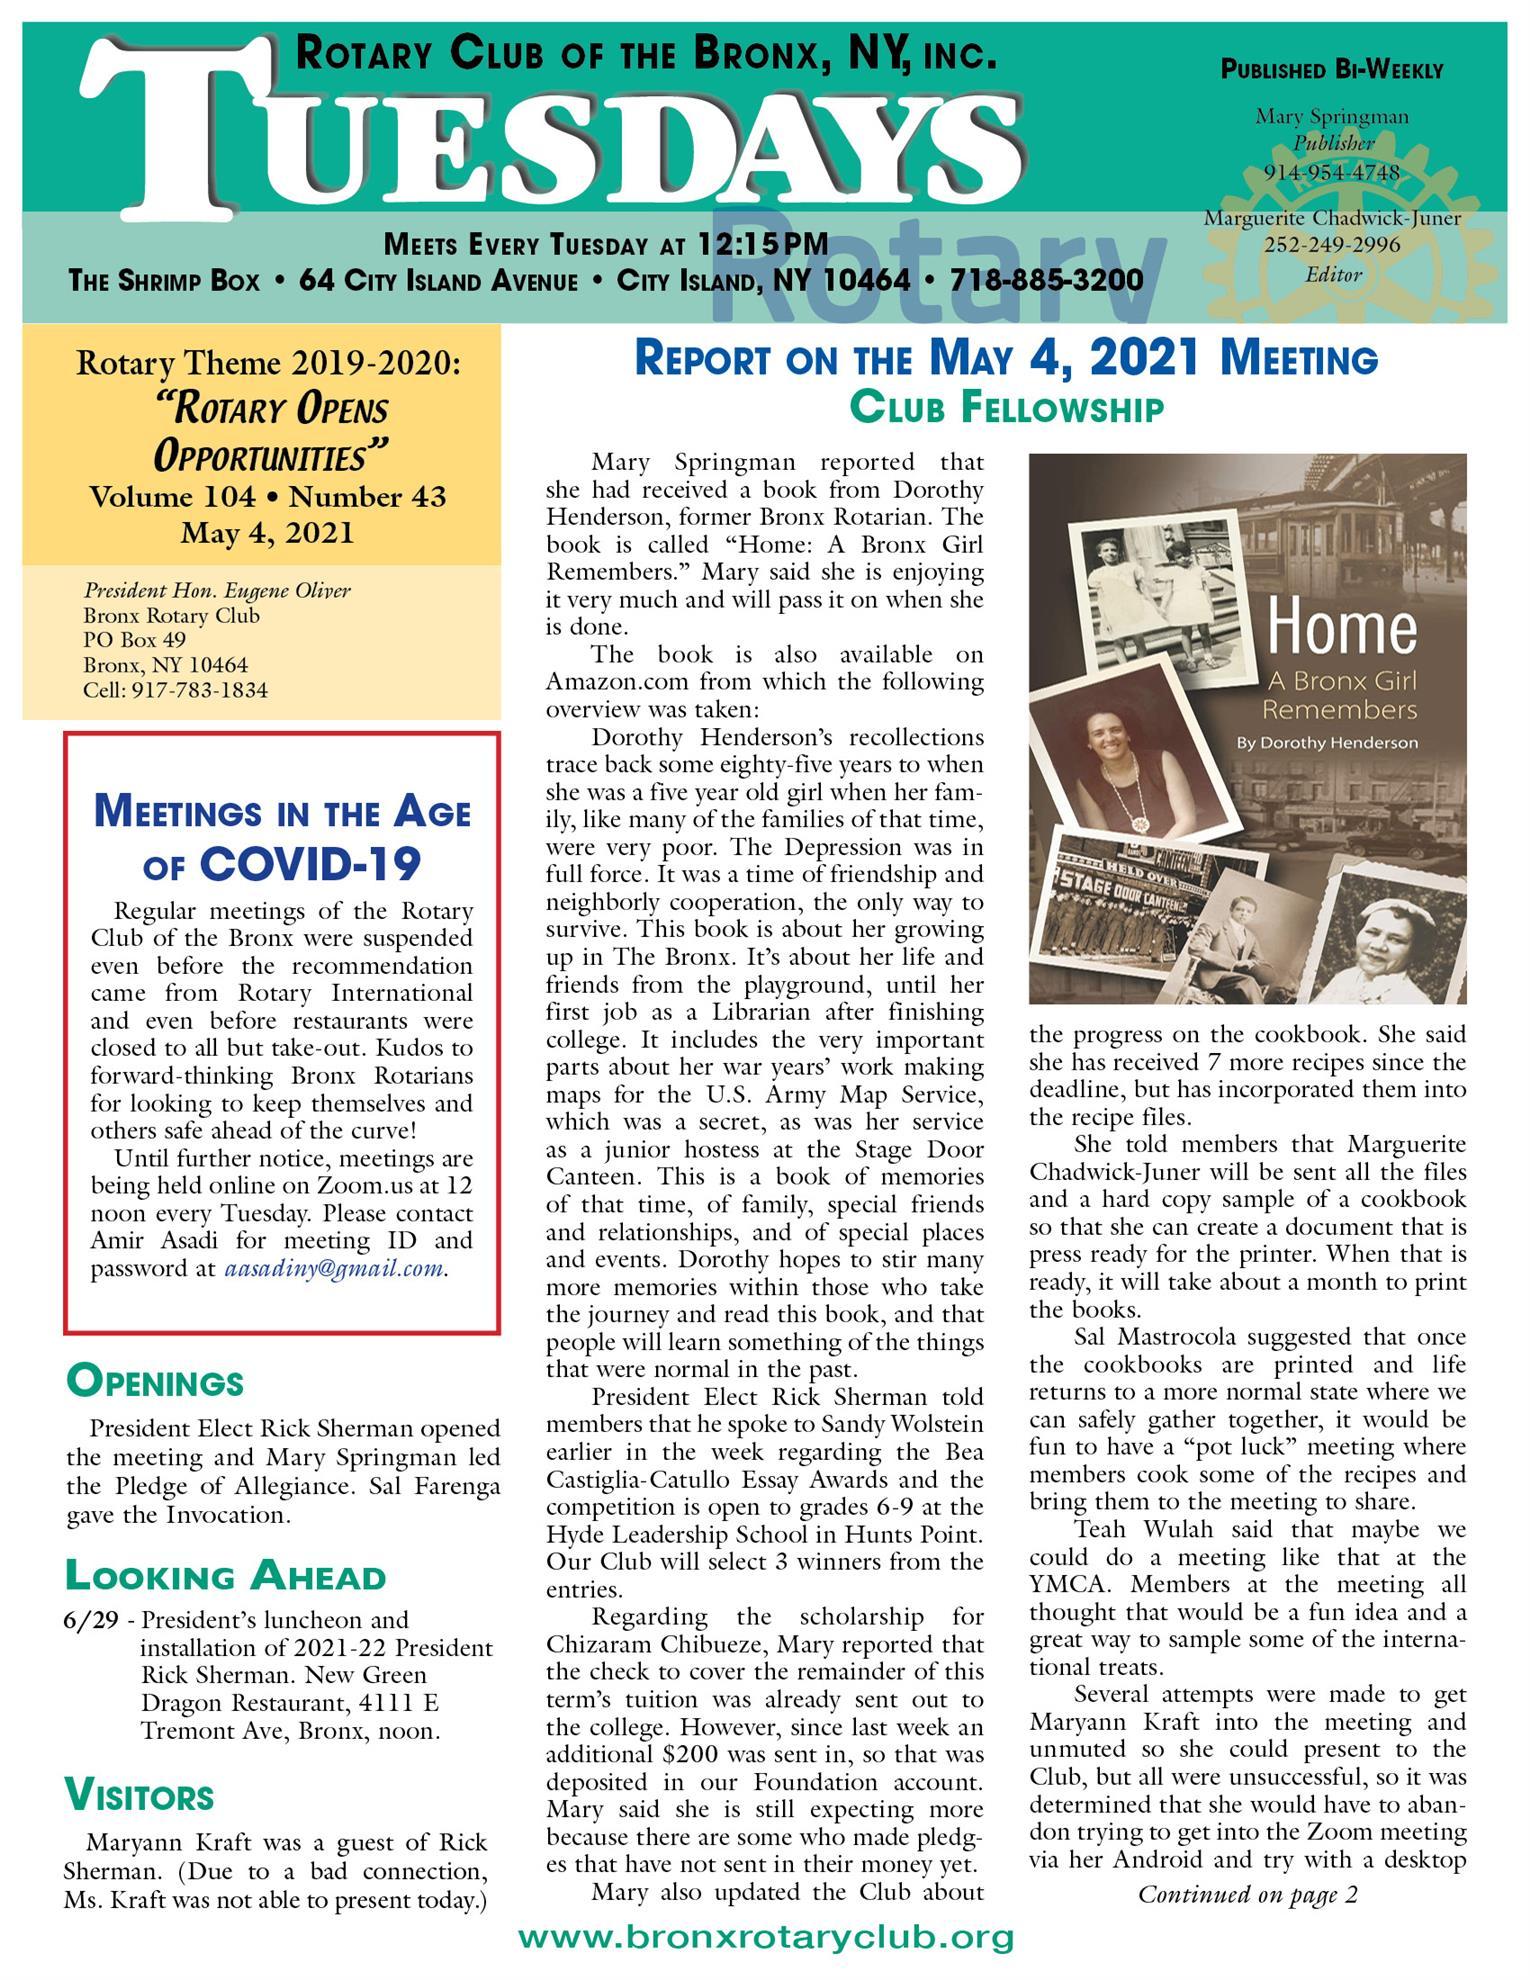 Tuesdays newsletter 5/4, 5/11 & 5/18 2021 p1